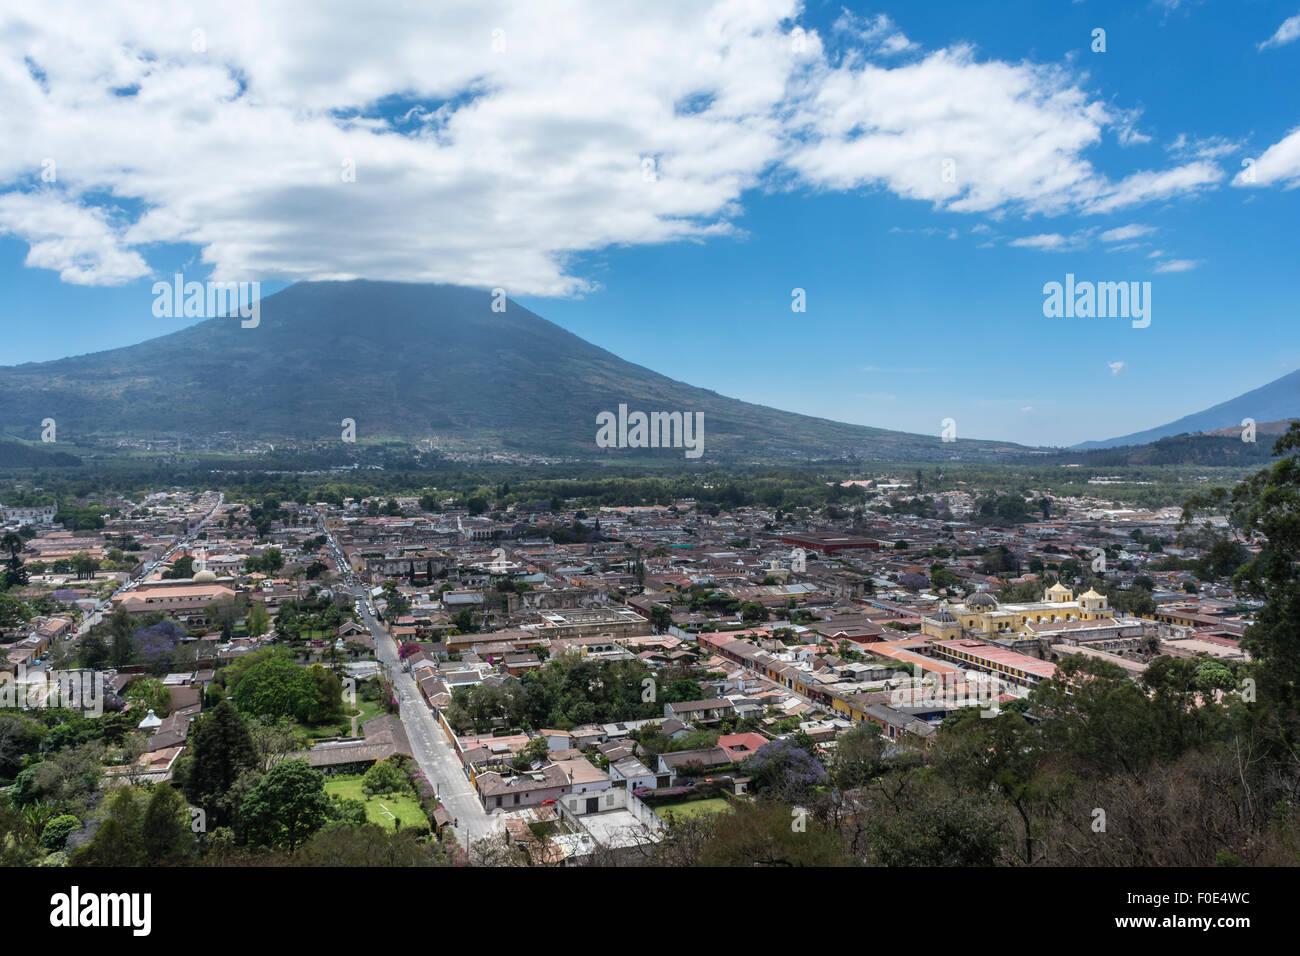 Antigua Guatemala, Guatemala - Stock Image